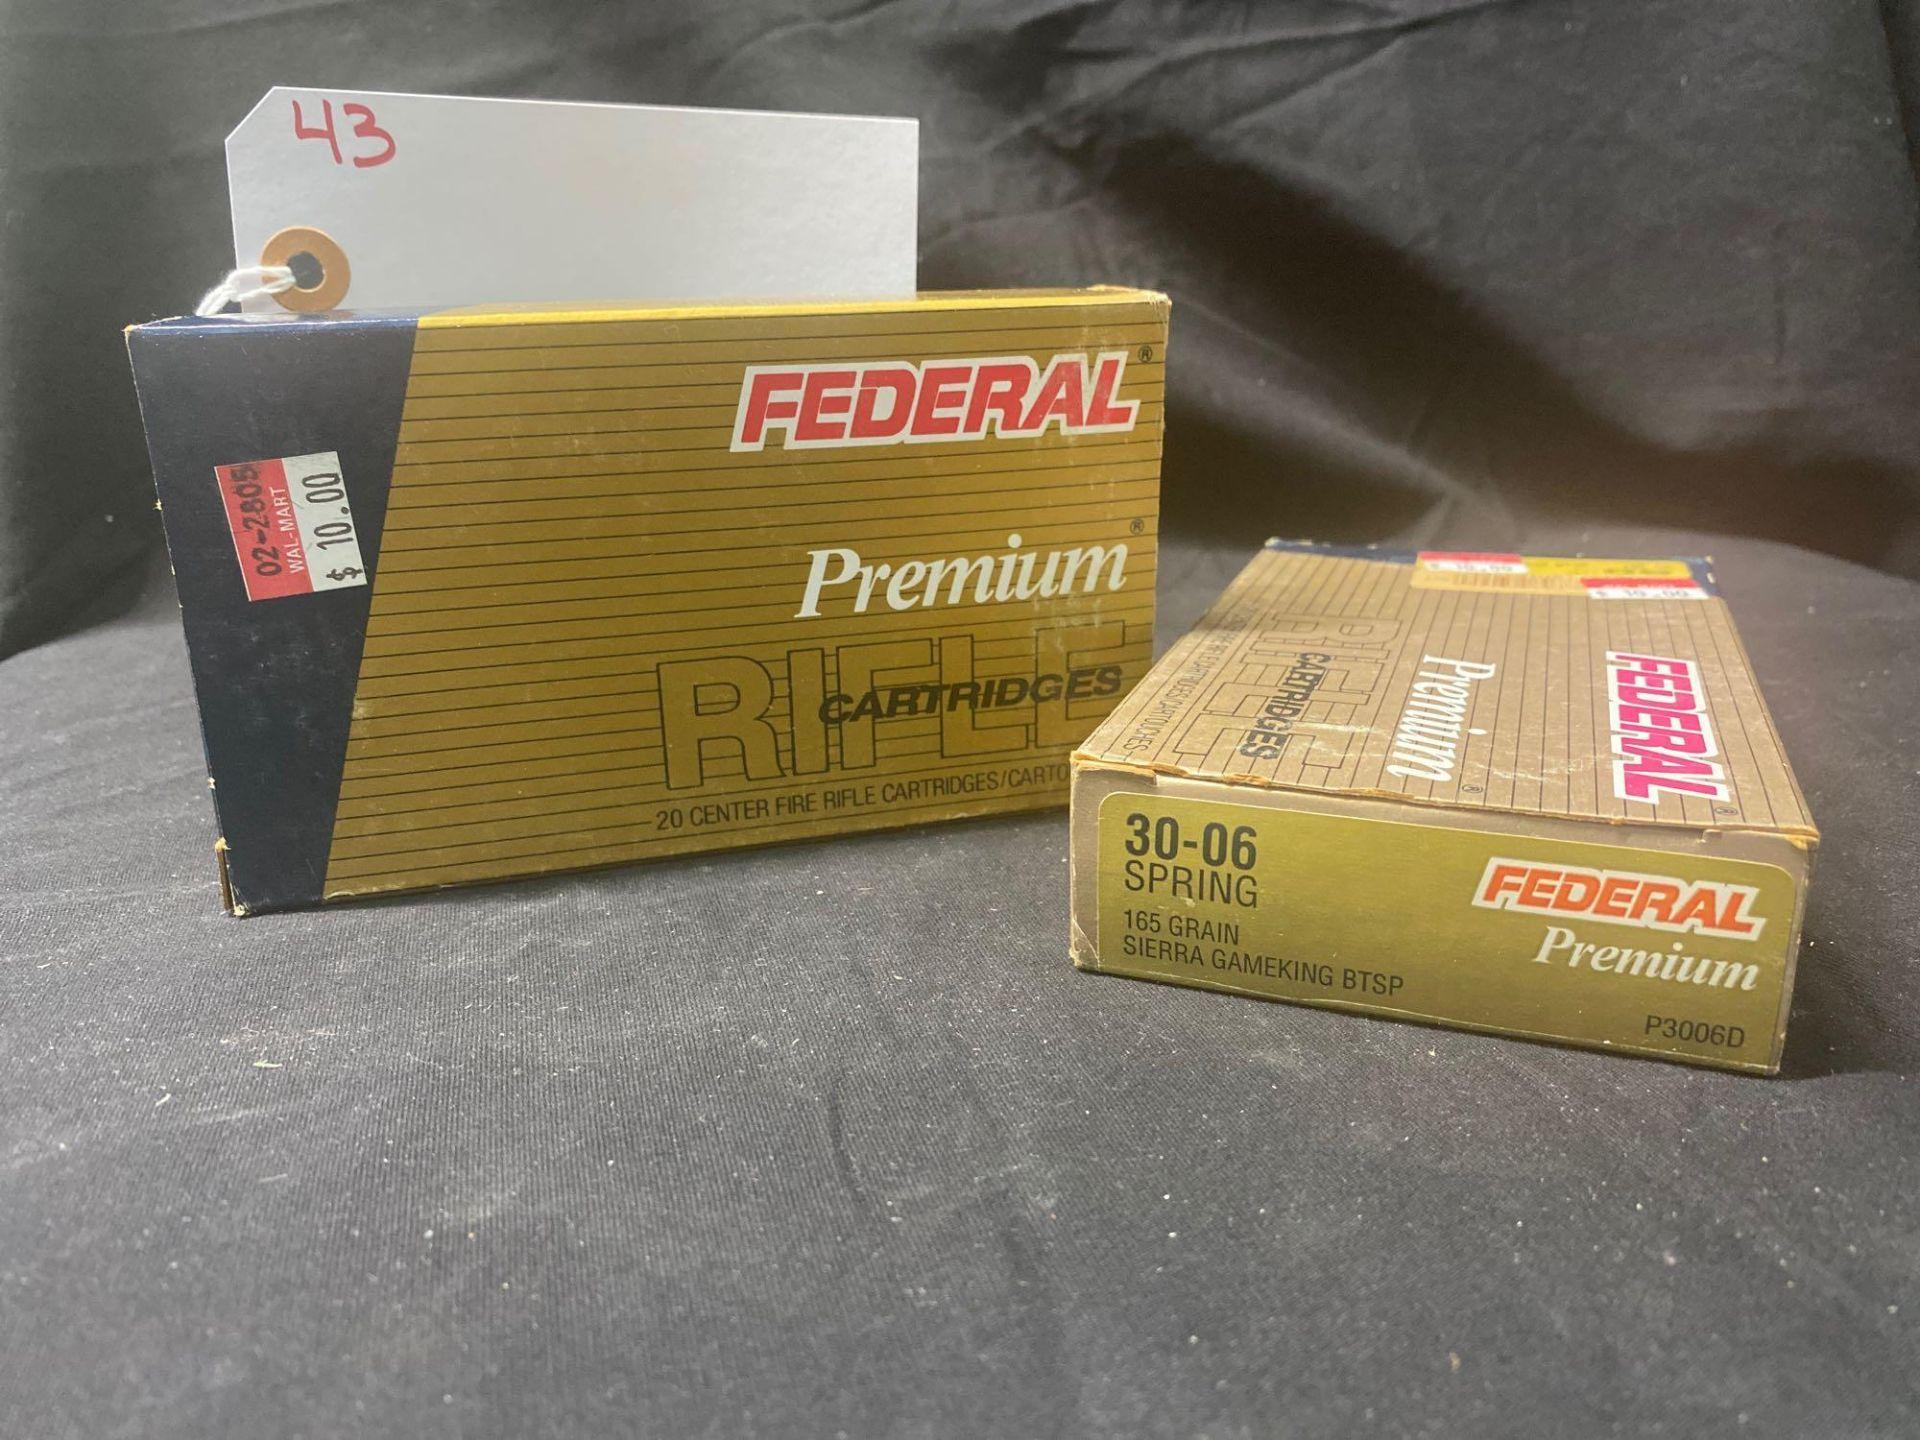 FEDERAL PREMIUM 30-06 CAL, (X2)